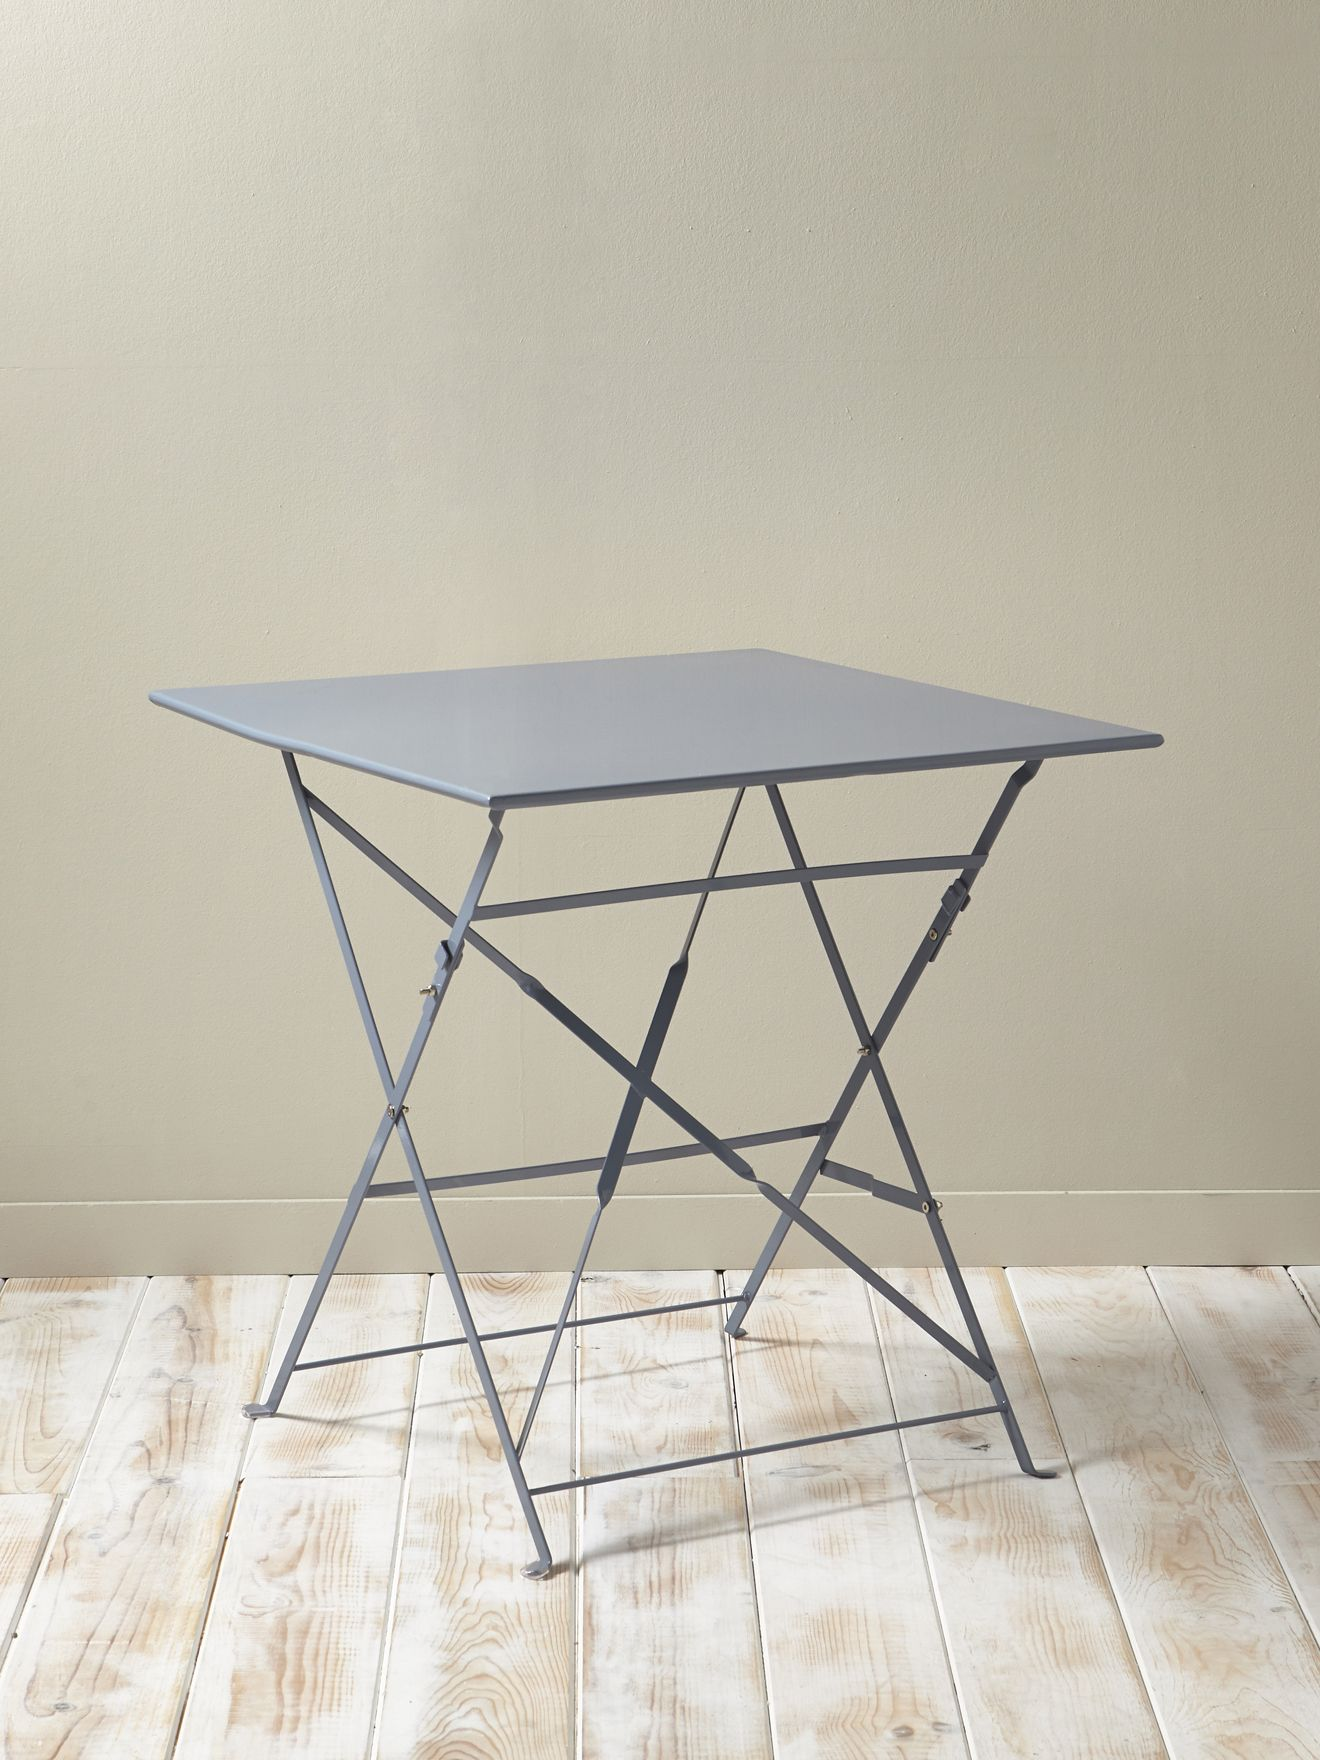 Table de jardin métal cyrillus 35 € http://www.cyrillus.fr/table ...